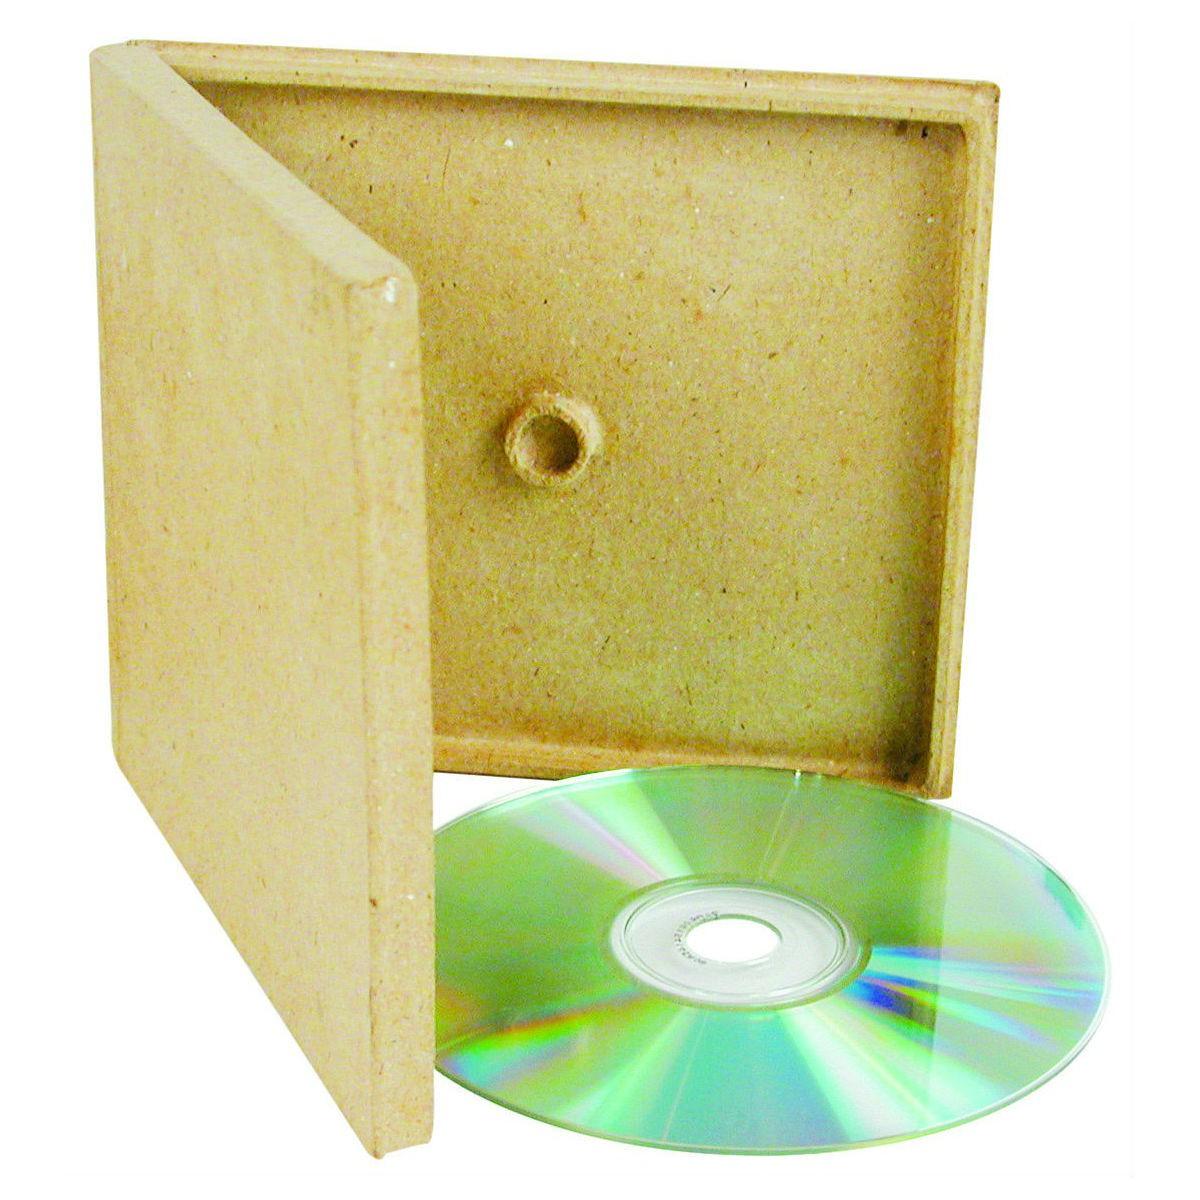 cd verpackung karton h lle pappe jewelcase format blanko zum selbstgestalten. Black Bedroom Furniture Sets. Home Design Ideas